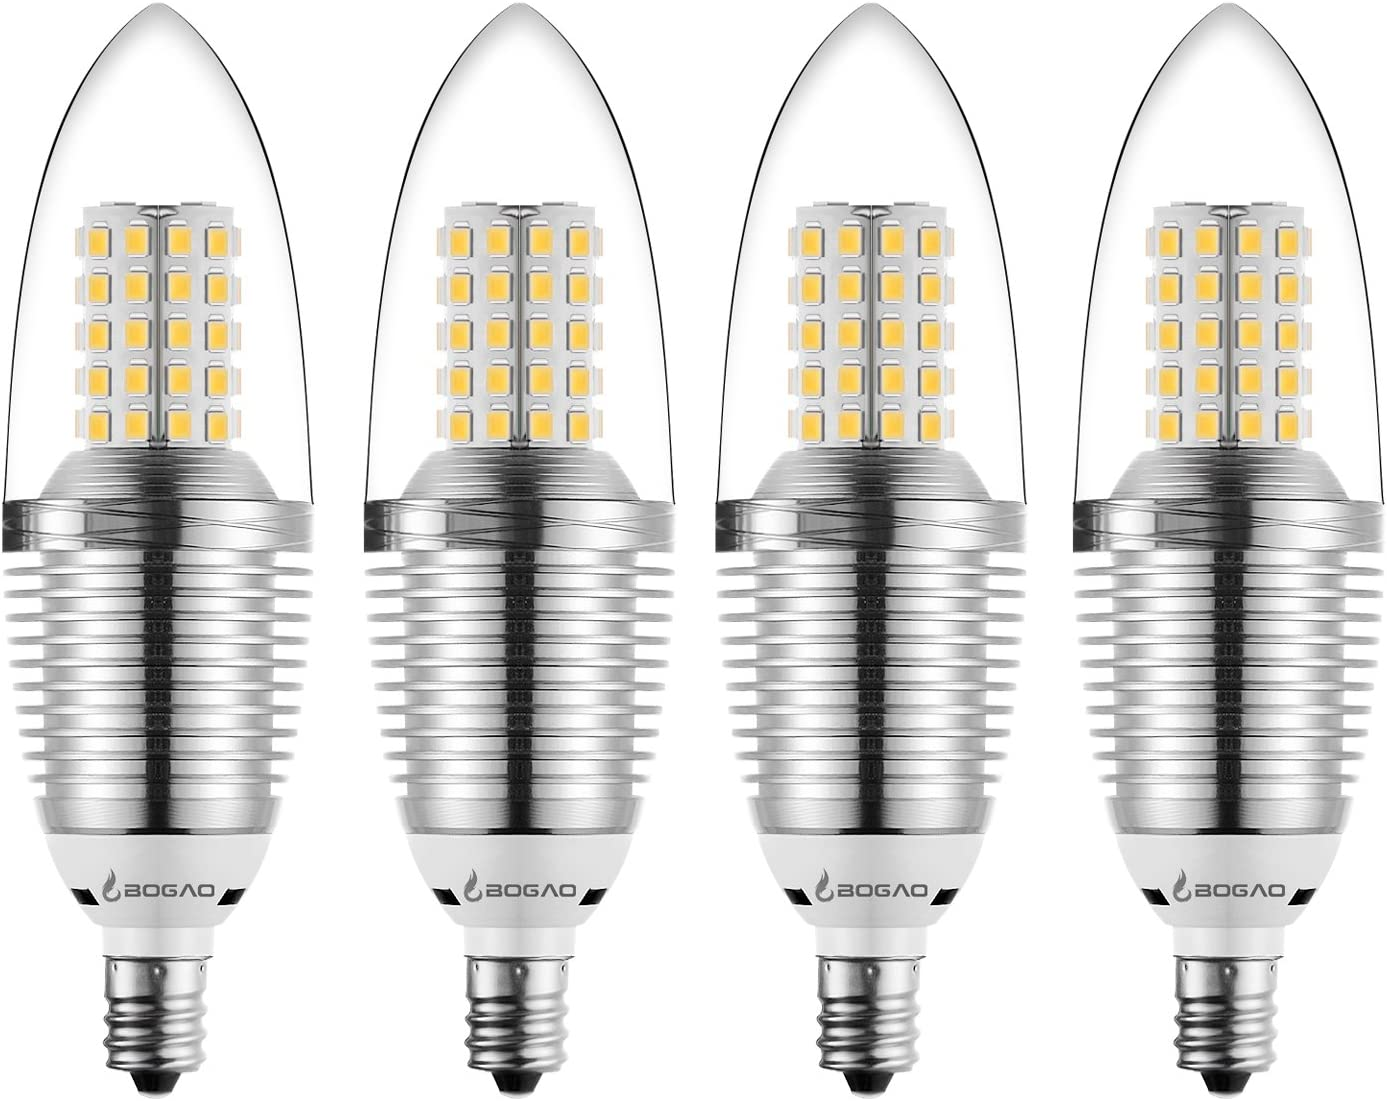 White,Torpedo Shape,Non-dimmable E12 LED Light Bulb,EKSAVE 12W E12 LED Candelabra Bulb Equivalent to 80-100 Watt Light Bulbs,1200 Lumens LED Candle Bulbs 6000K,4pcs